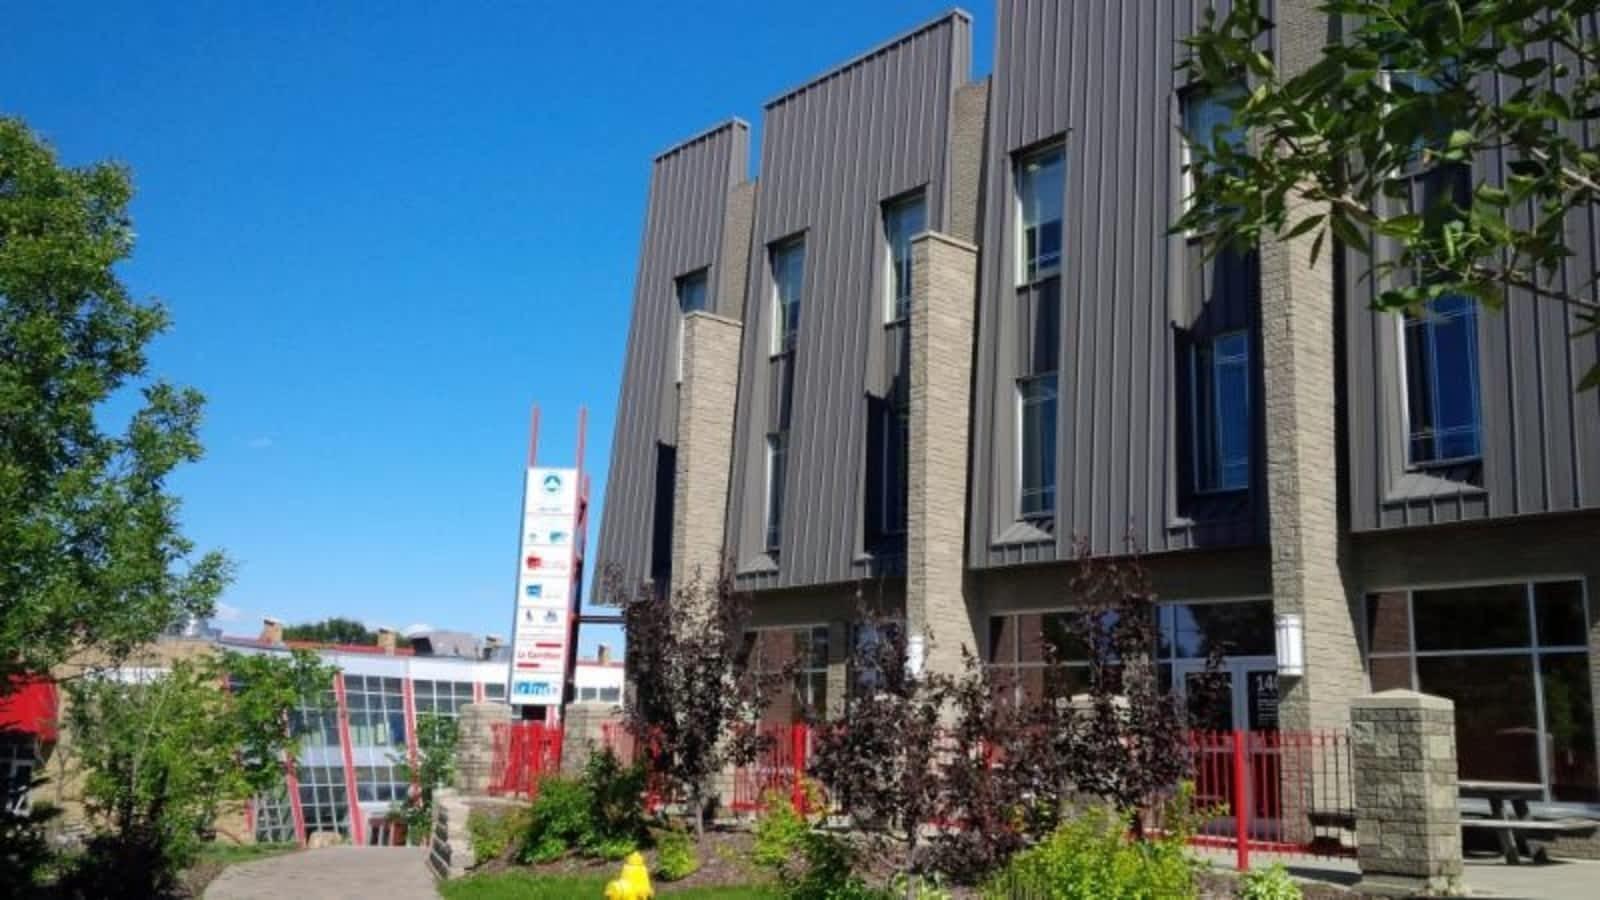 Ecole Claudette Et Denis Tardif Opening Hours 10 Hawkins Crescent Sherwood Park Ab